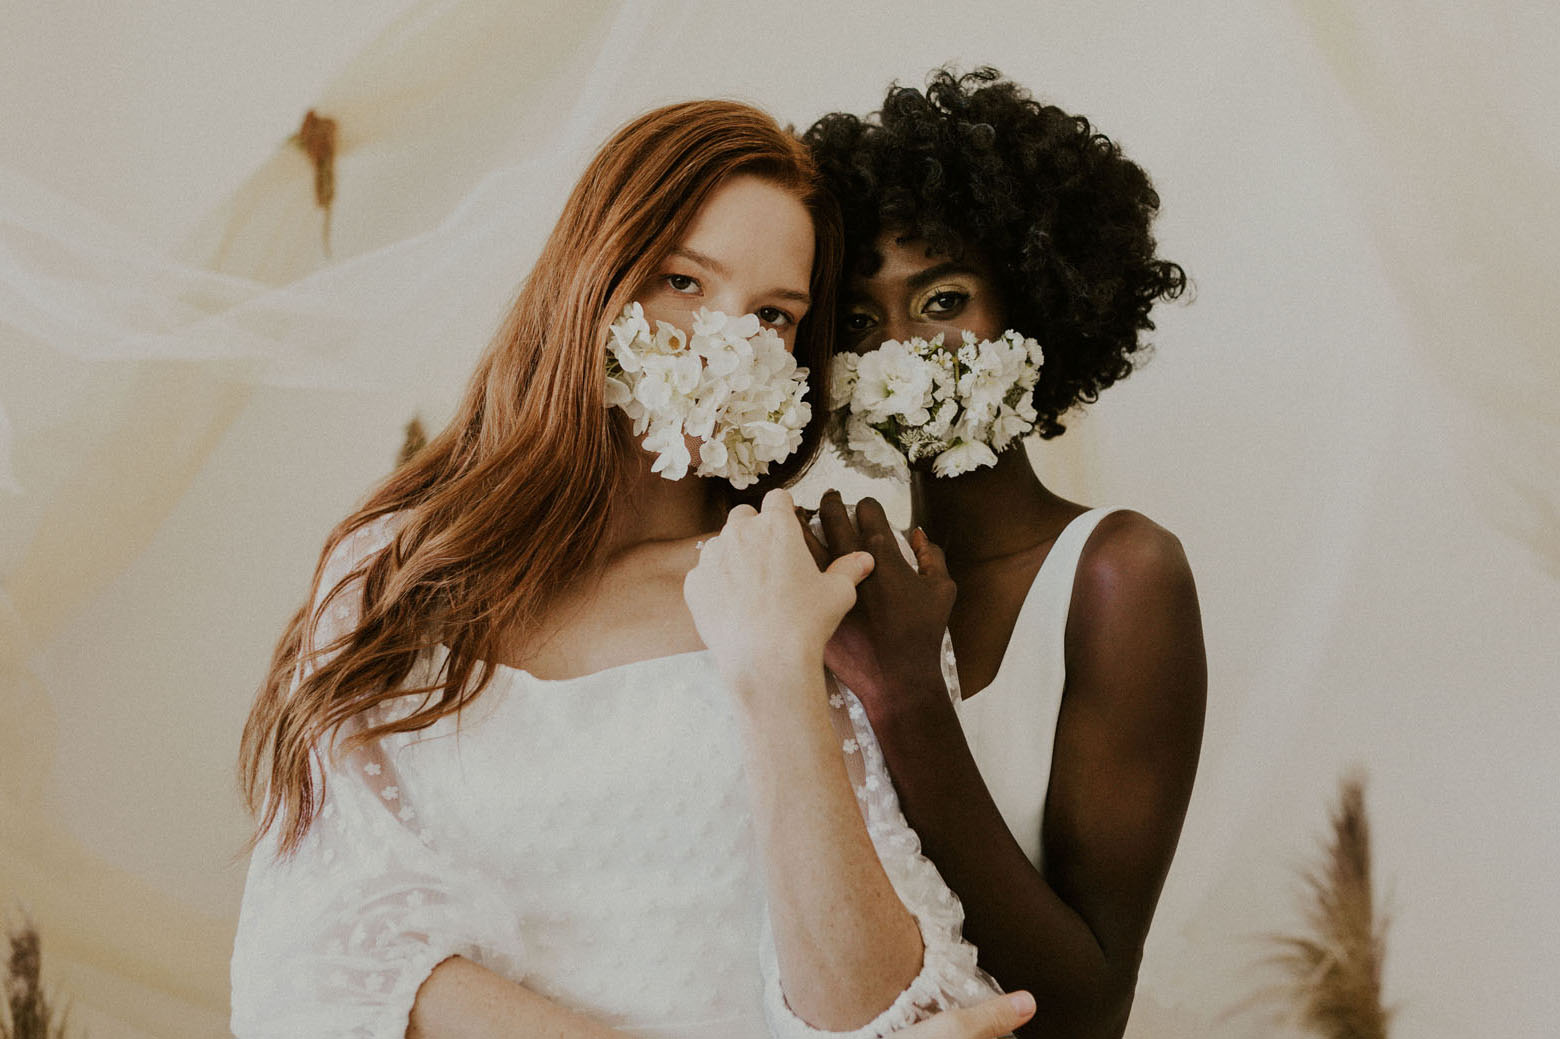 "2020 brides ""width ="" 1560 ""height ="" 1039 ""data-pin-description ="" Un hommage aux mariées 2020 ""data-pin-title ="" COVID Brides in Fresh Floral Face Masks ""srcset ="" https: // greenweddingshoes. com / wp-content / uploads / 2020/09 / covidbridal-08.jpg 1560w, https://i0.wp.com/greenweddingshoes.com/wp-content/uploads/2020/09/covidbridal-08.jpg?resize = 300,200 300w, https://i0.wp.com/greenweddingshoes.com/wp-content/uploads/2020/09/covidbridal-08.jpg?resize=1024,682 1024w, https://i0.wp.com /greenweddingshoes.com/wp-content/uploads/2020/09/covidbridal-08.jpg?resize=768,512 768w, https://i0.wp.com/greenweddingshoes.com/wp-content/uploads/2020/09/ covidbridal-08.jpg? resize = 650,434 650w, https://i0.wp.com/greenweddingshoes.com/wp-content/uploads/2020/09/covidbridal-08.jpg?resize=976,650 976w, https: // i0.wp.com/greenweddingshoes.com/wp-content/uploads/2020/09/covidbridal-08.jpg?resize=90,60 90w, https://i0.wp.com/greenweddingshoes.com/wp-content /uploads/2020/09/covidbridal-08.jpg?resize=180,120 180w, https://i0.wp.co m / greenweddingshoes.com / wp-content / uploads / 2020/09 / covidbridal-08.jpg? resize = 800533 800w, https://i0.wp.com/greenweddingshoes.com/wp-content/uploads/2020/09 /covidbridal-08.jpg?resize=400,266 400w, https://i0.wp.com/greenweddingshoes.com/wp-content/uploads/2020/09/covidbridal-08.jpg?resize=1536,1023 1536w ""tailles = ""(largeur maximale: 1560px) 100vw, 1560px"" /></p> <p style="